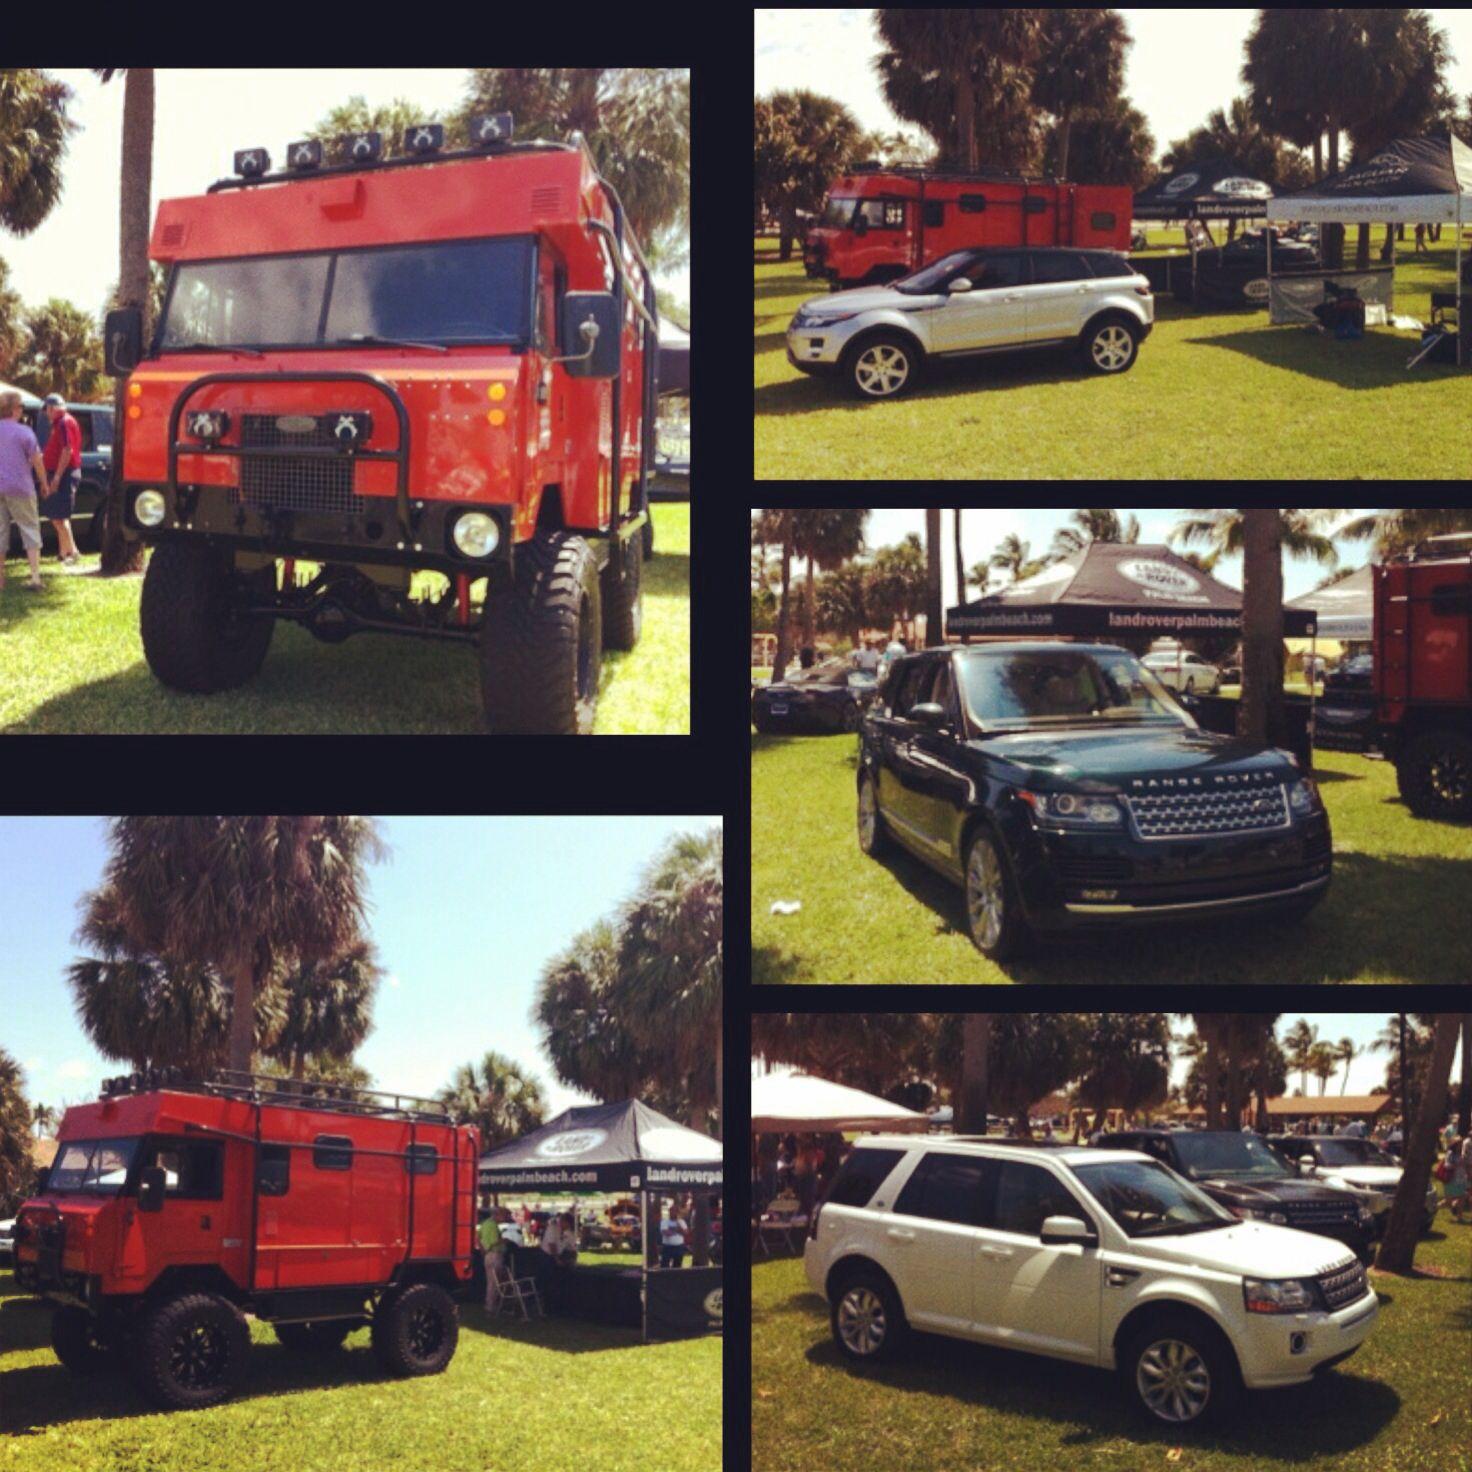 Visit Us Today At CarlinPark In Jupiter FL For The Wheels Across - Car show jupiter fl